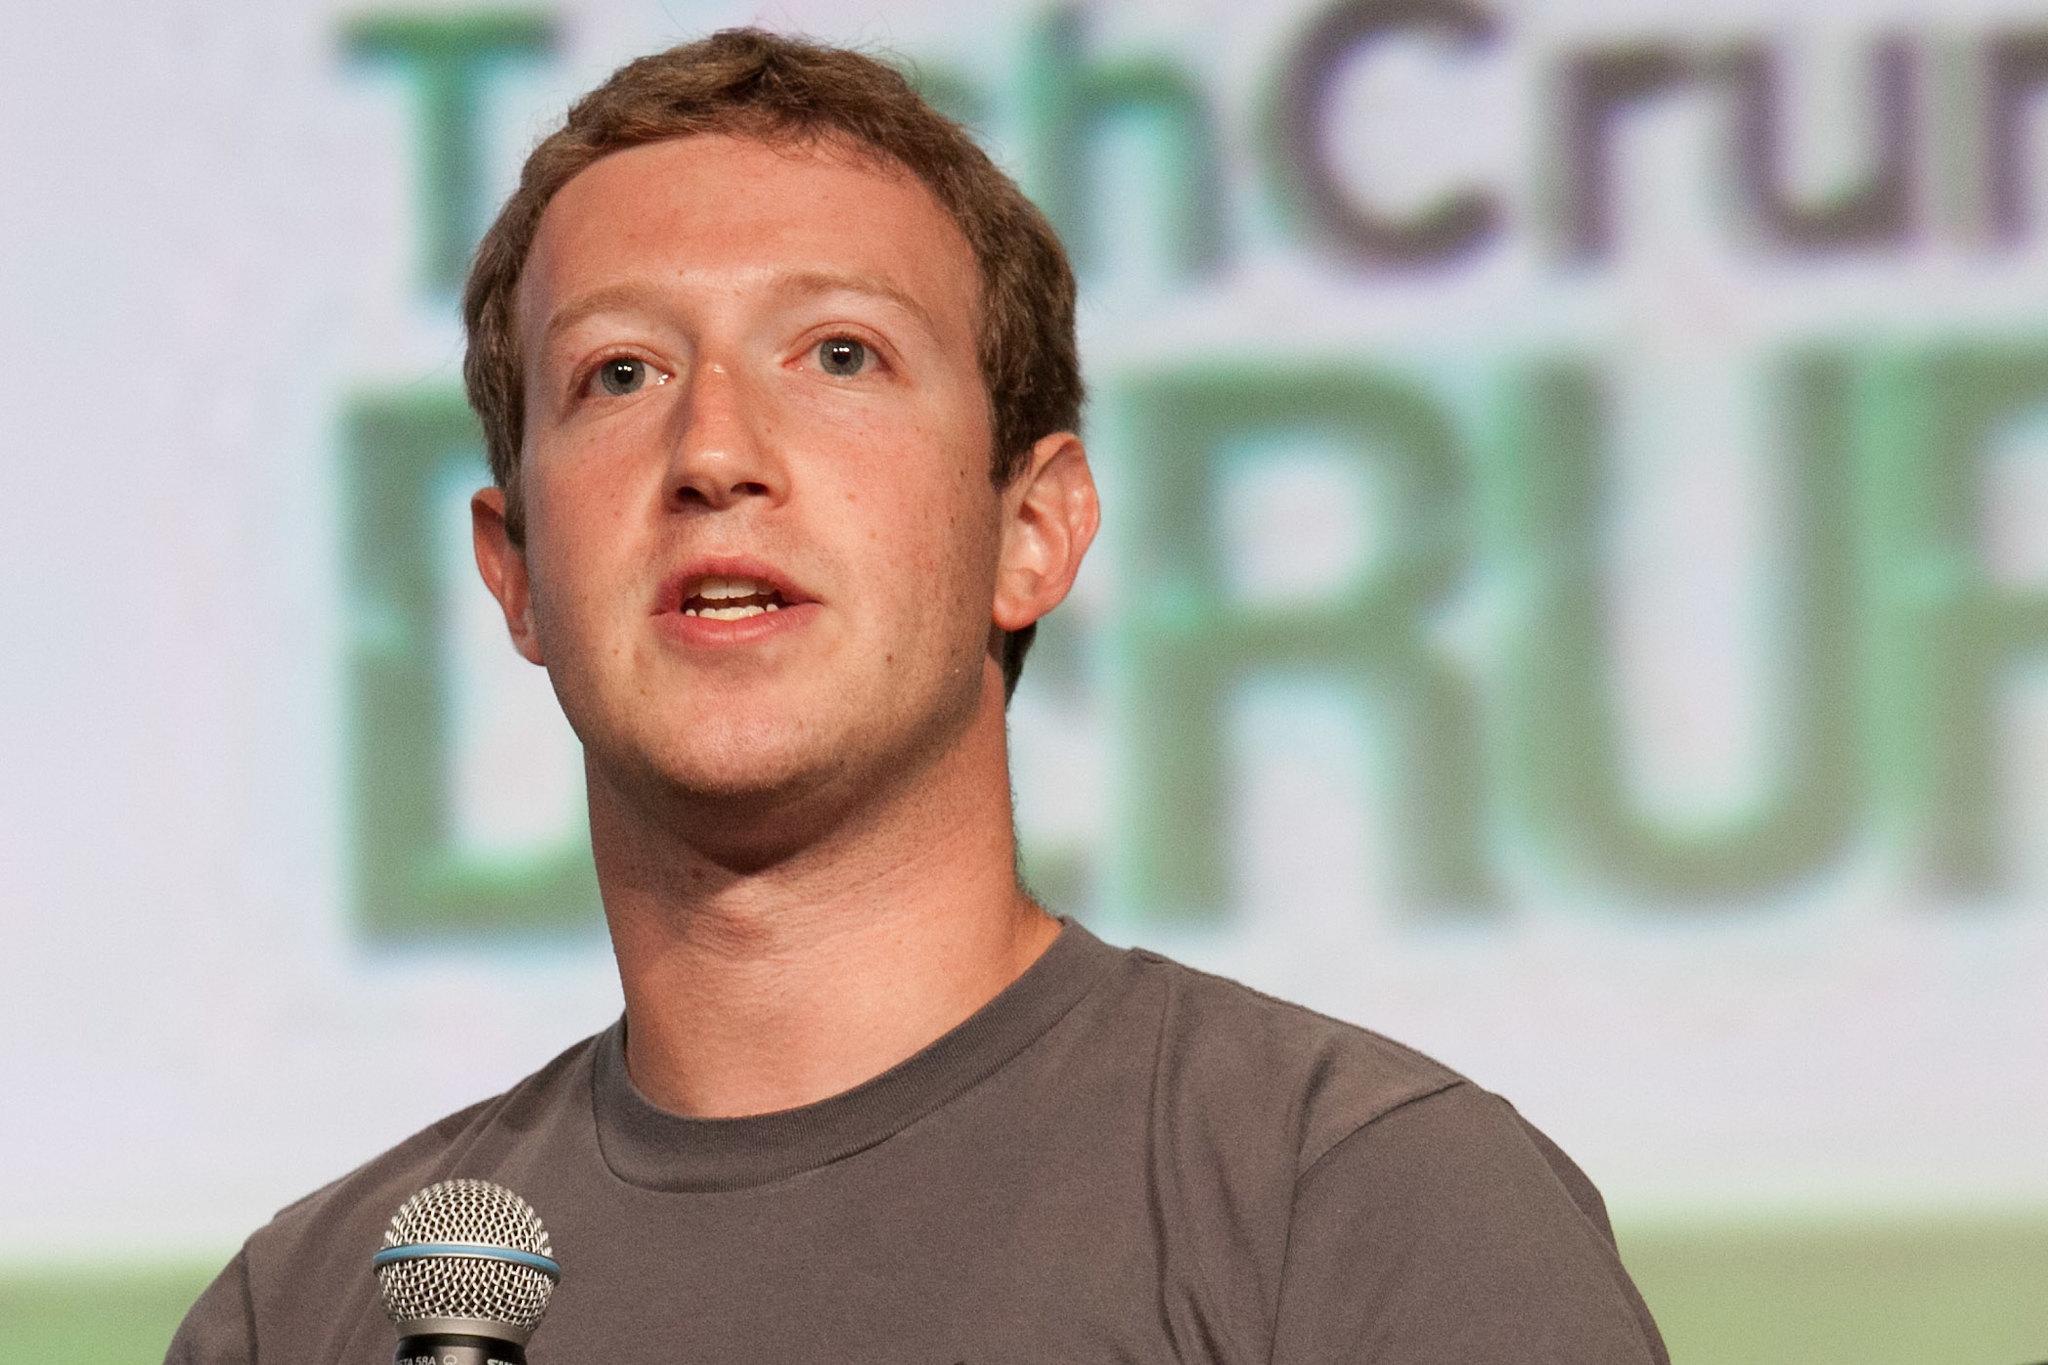 Facebook CEO Mark Zuckerberg -